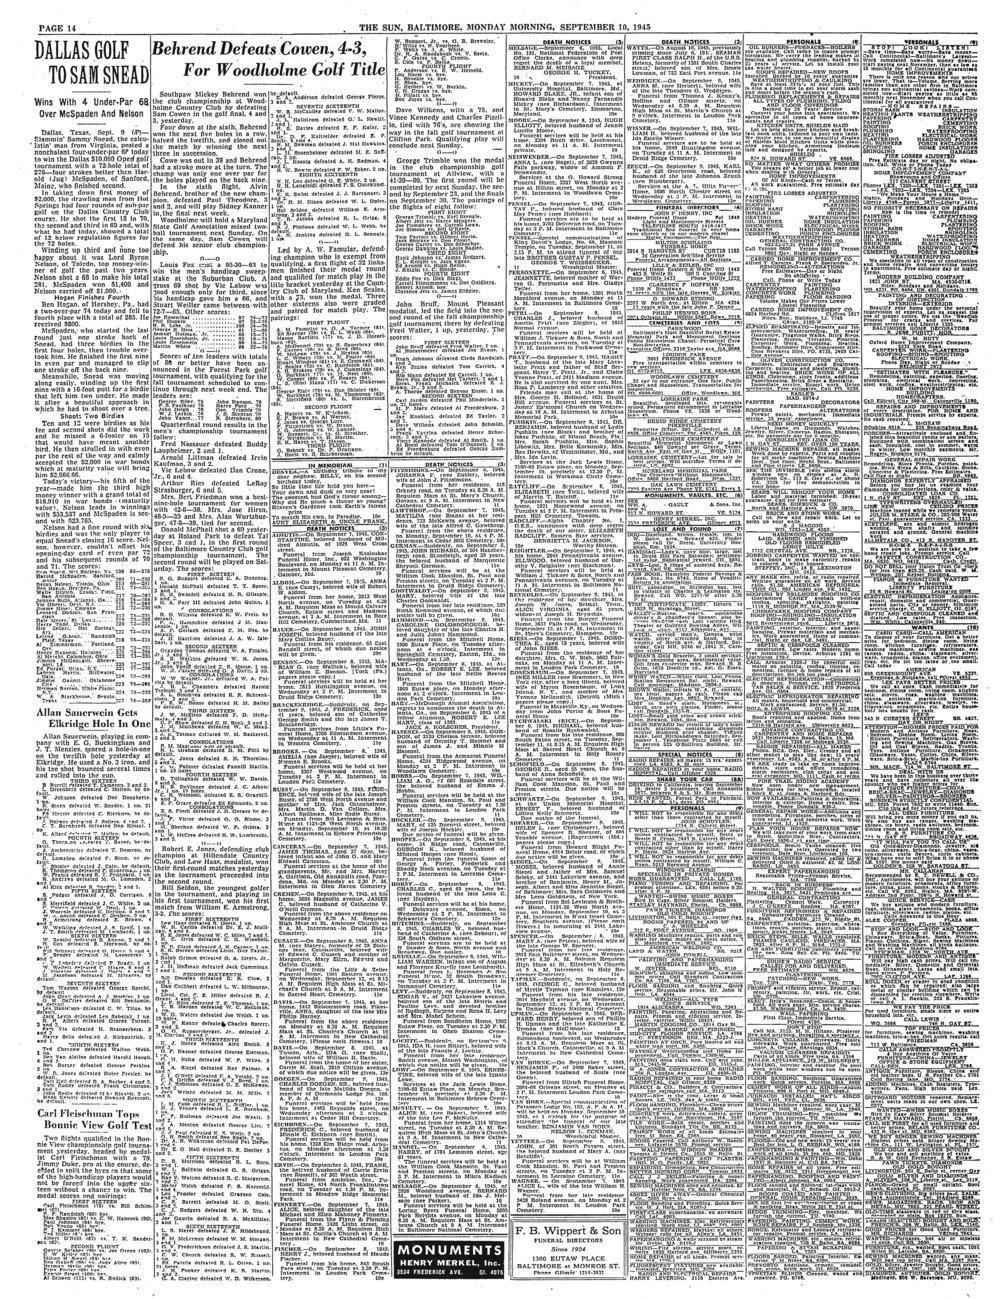 1945-9-10-DEATH NOTICES-PRATT, M-2.jpg